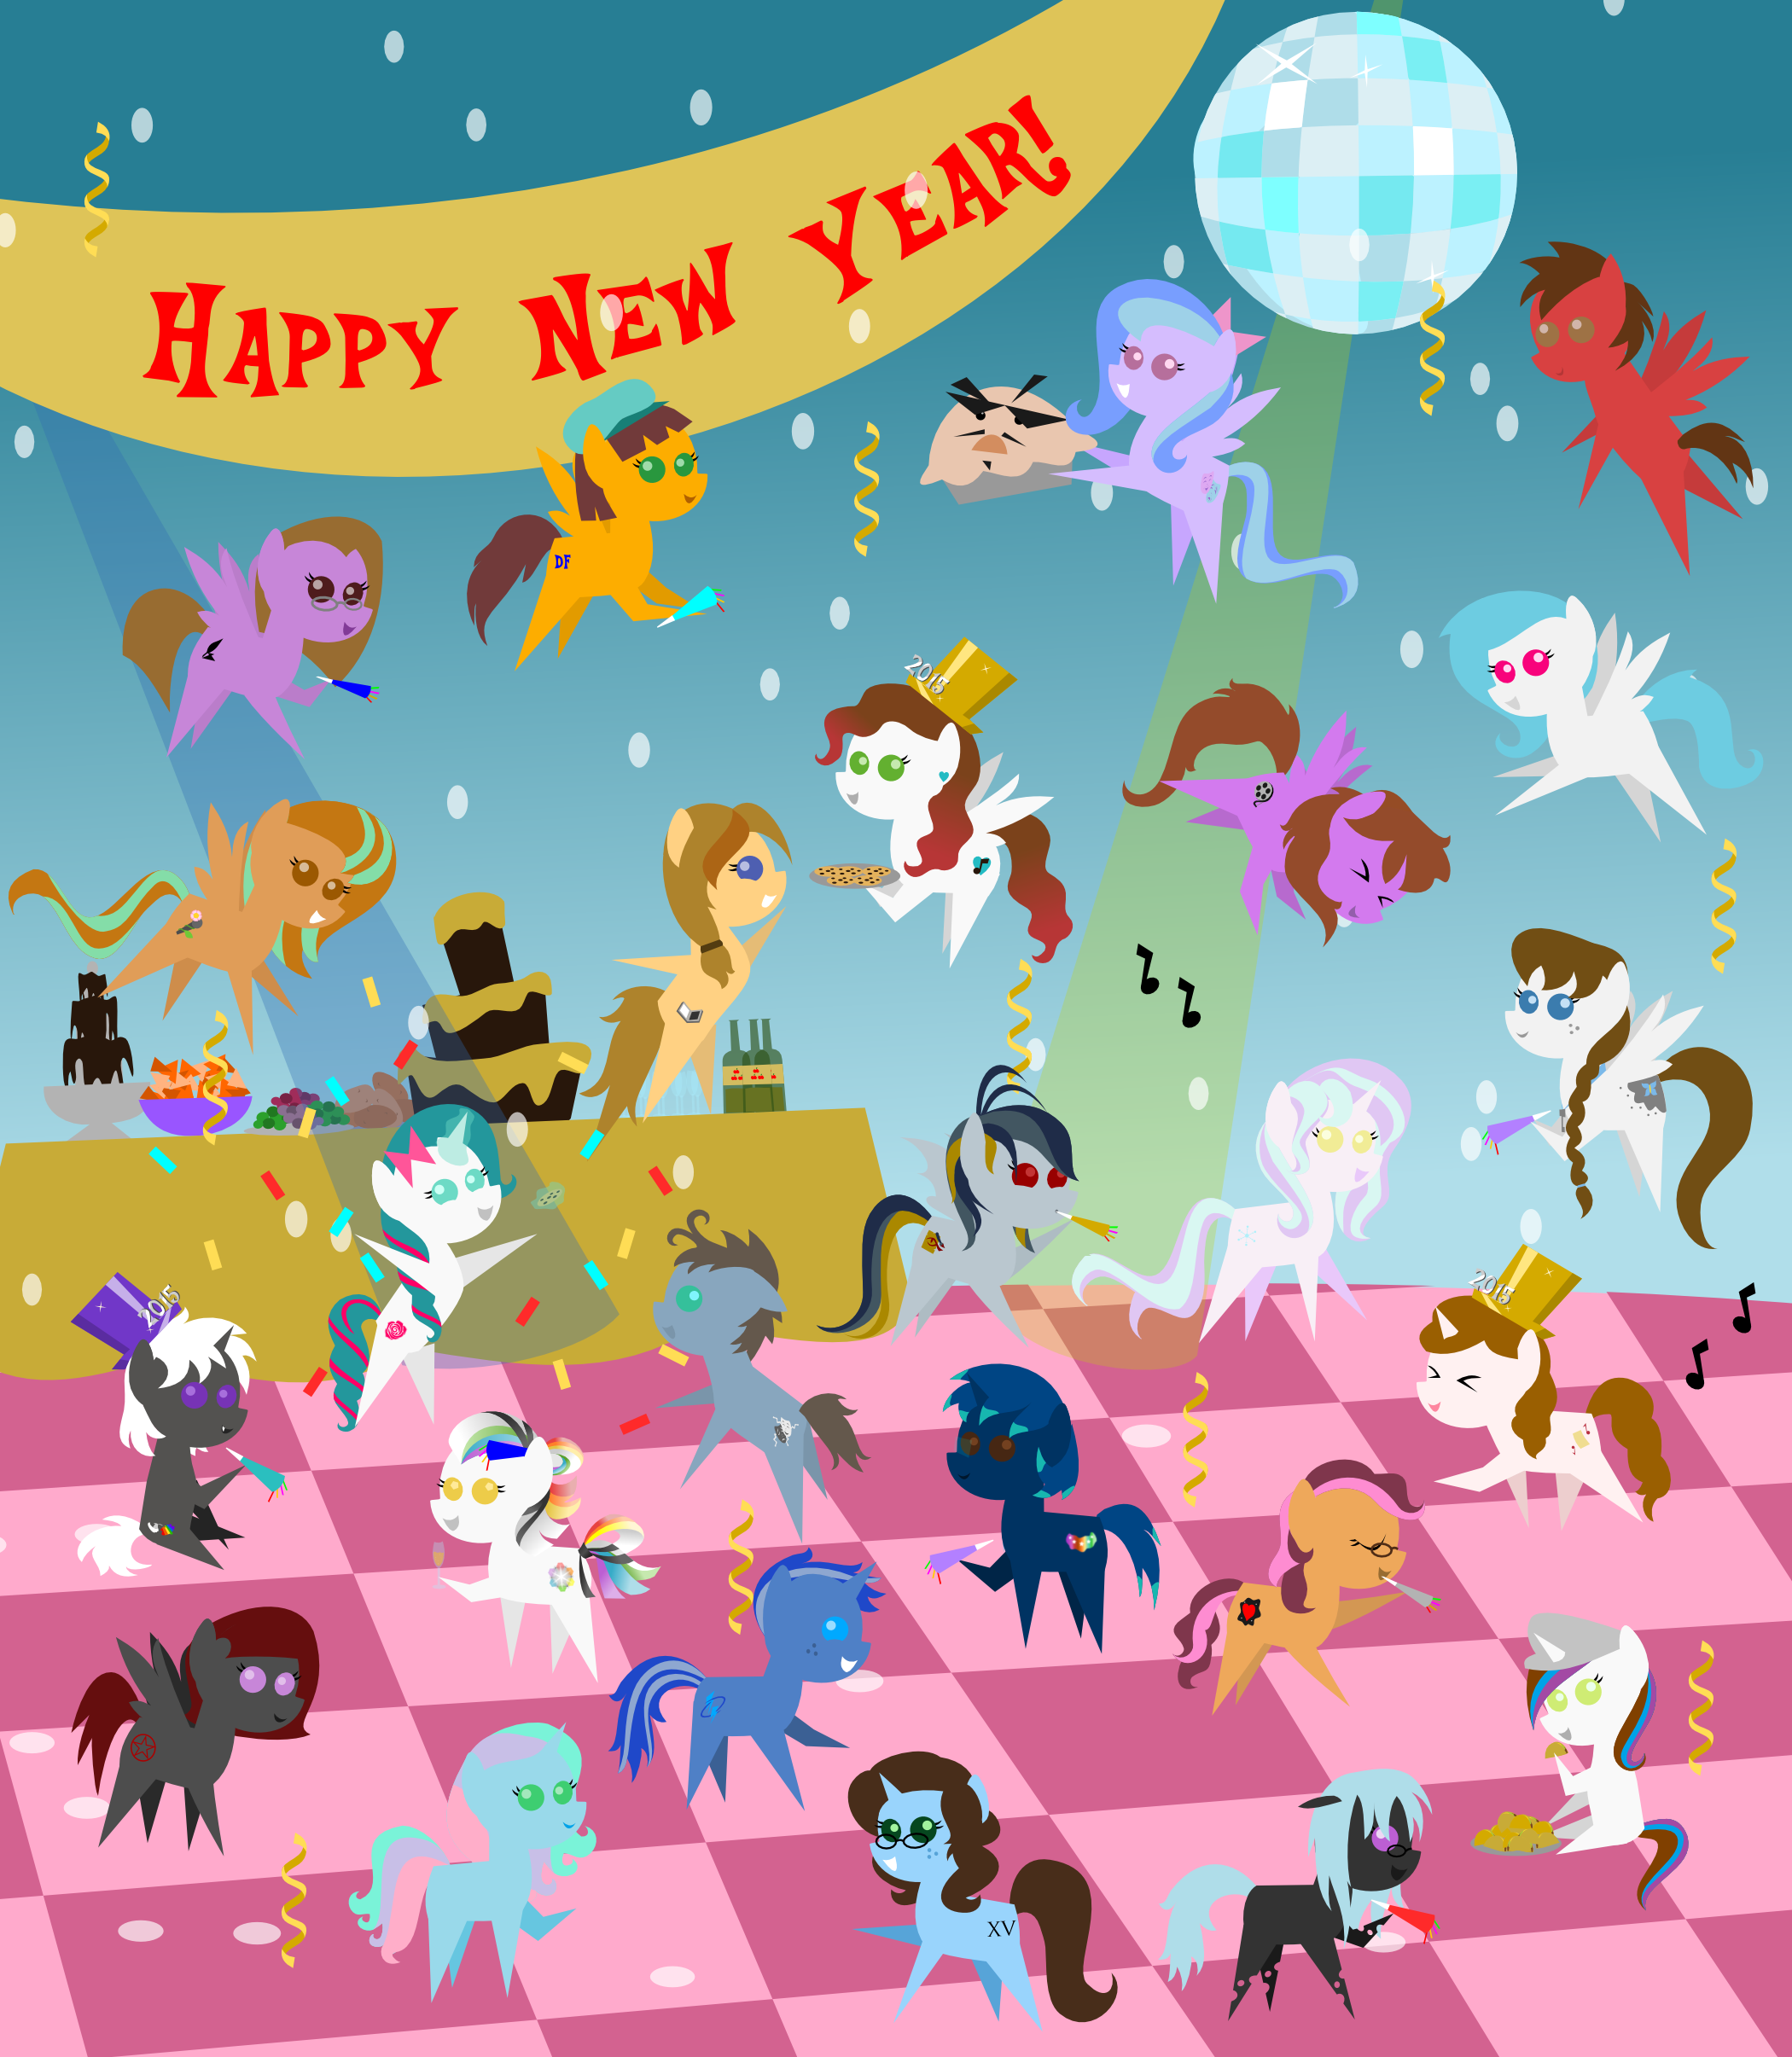 New Years Eve Countdown by My Little Pandas | Teachers